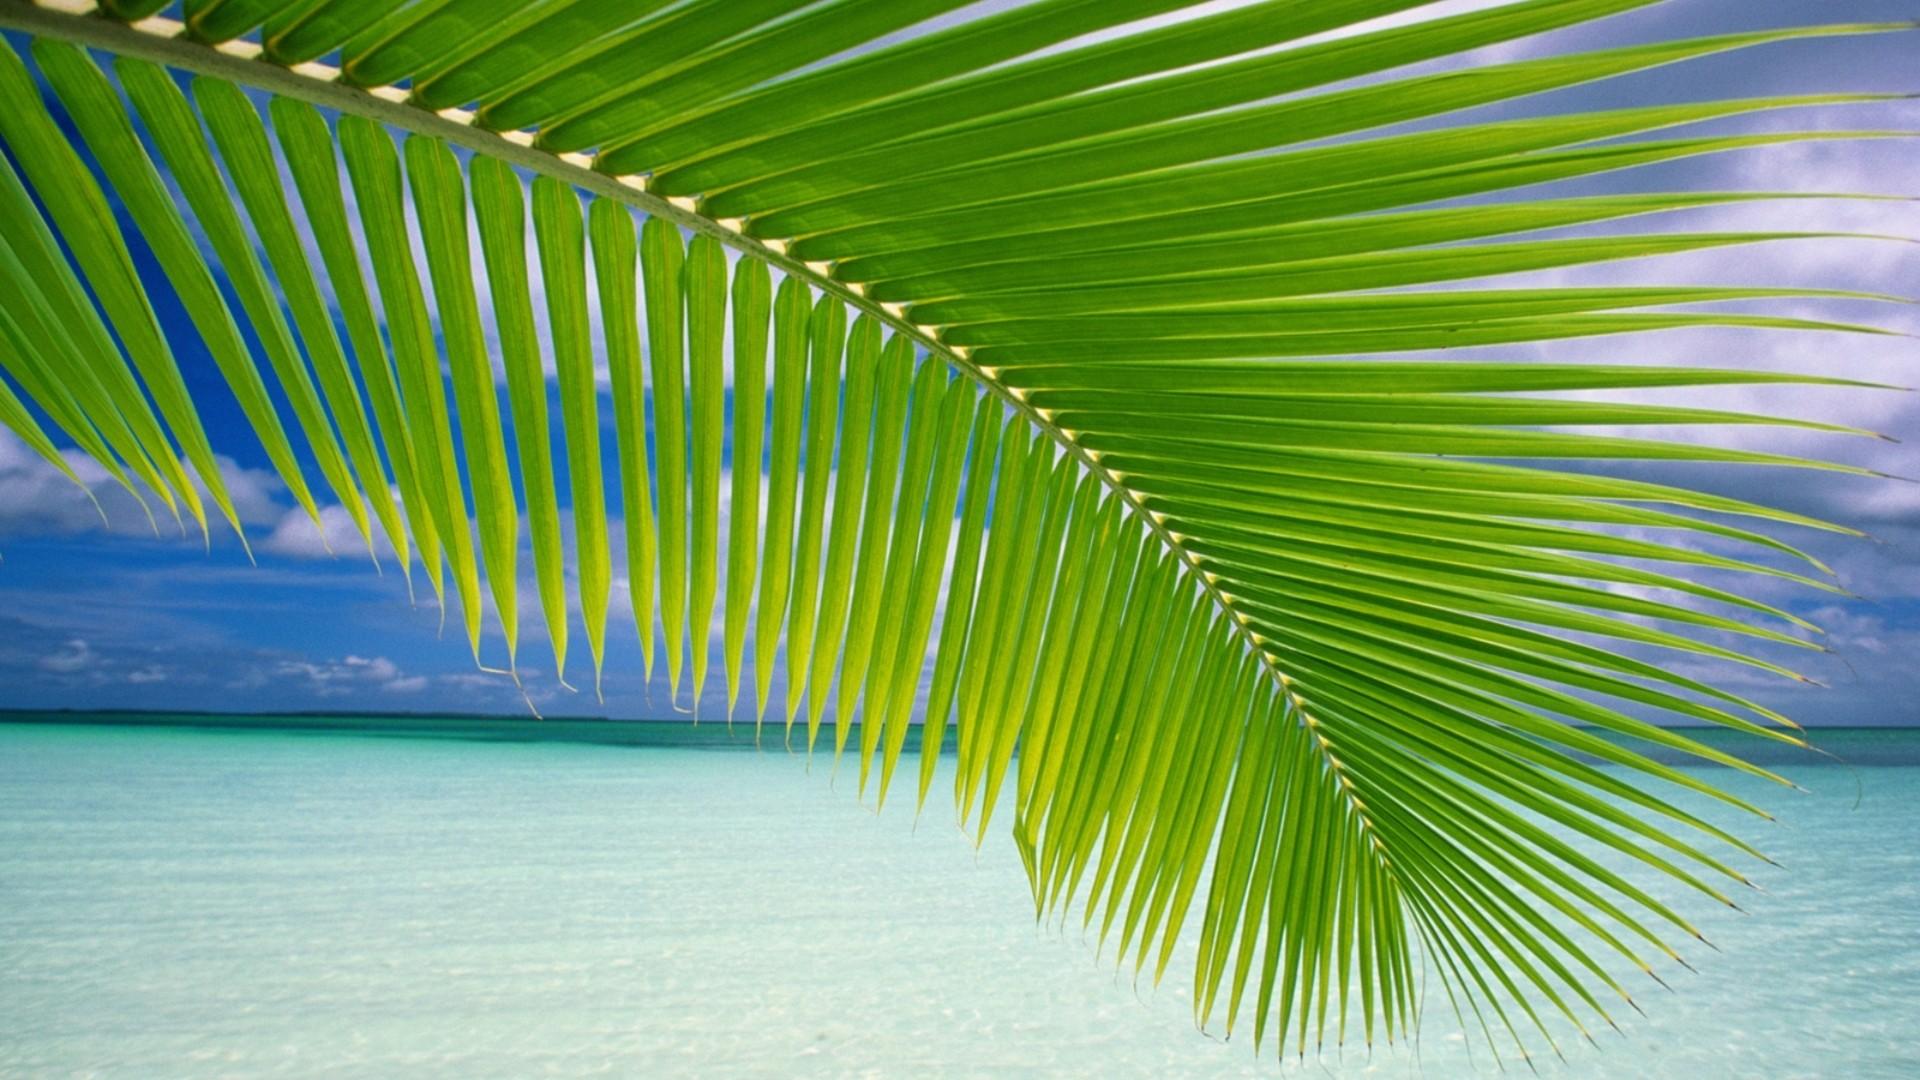 General 1920x1080 landscape palm trees beach green sea horizon tropical nature